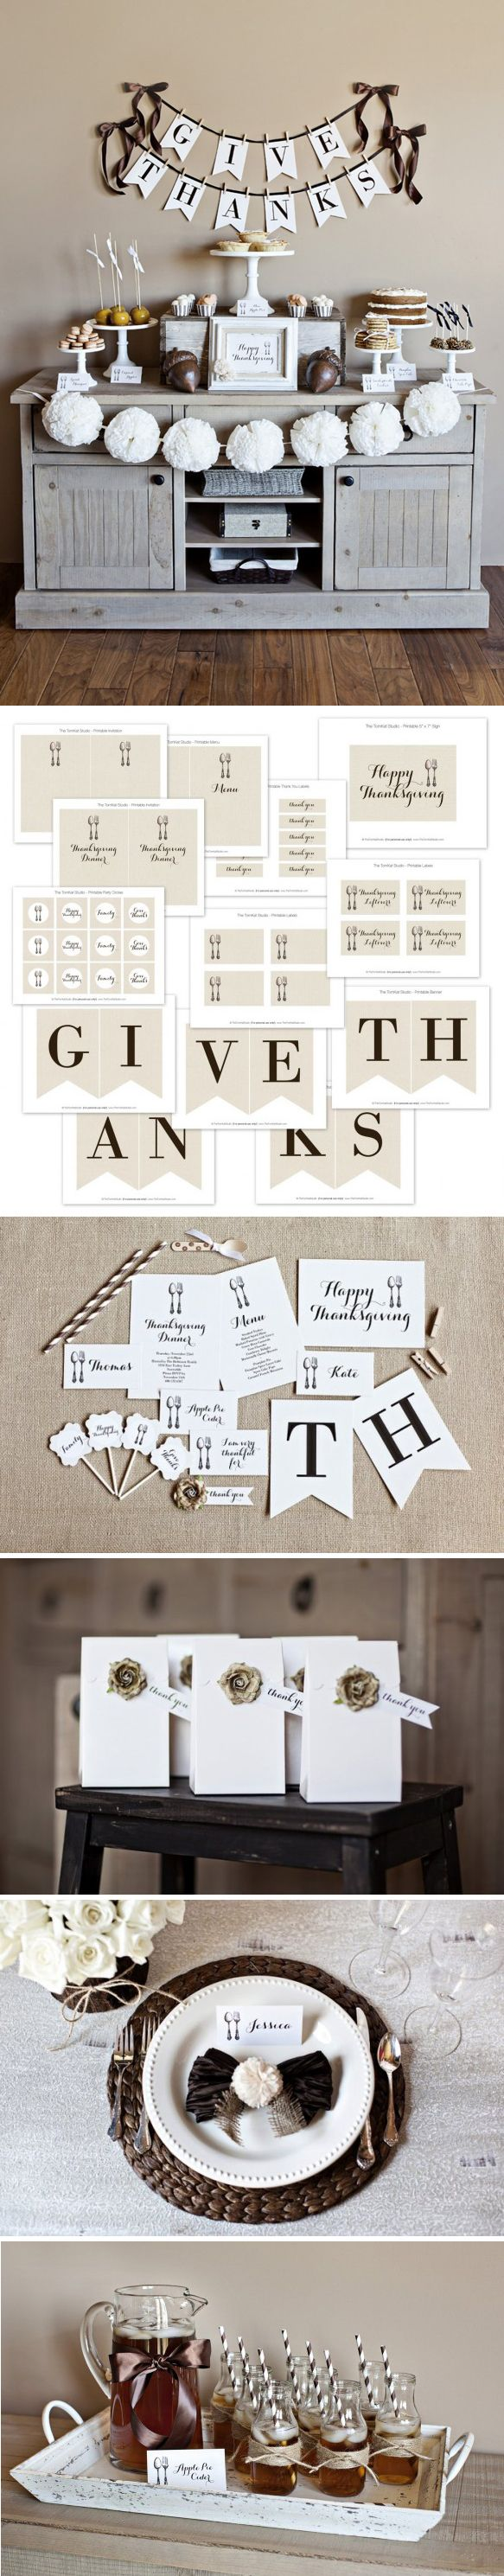 GiveThanks Collection 2012 - free printables from TheTomkat Studio http://www.thetomkatstudio.com/thanksgivingprintables/